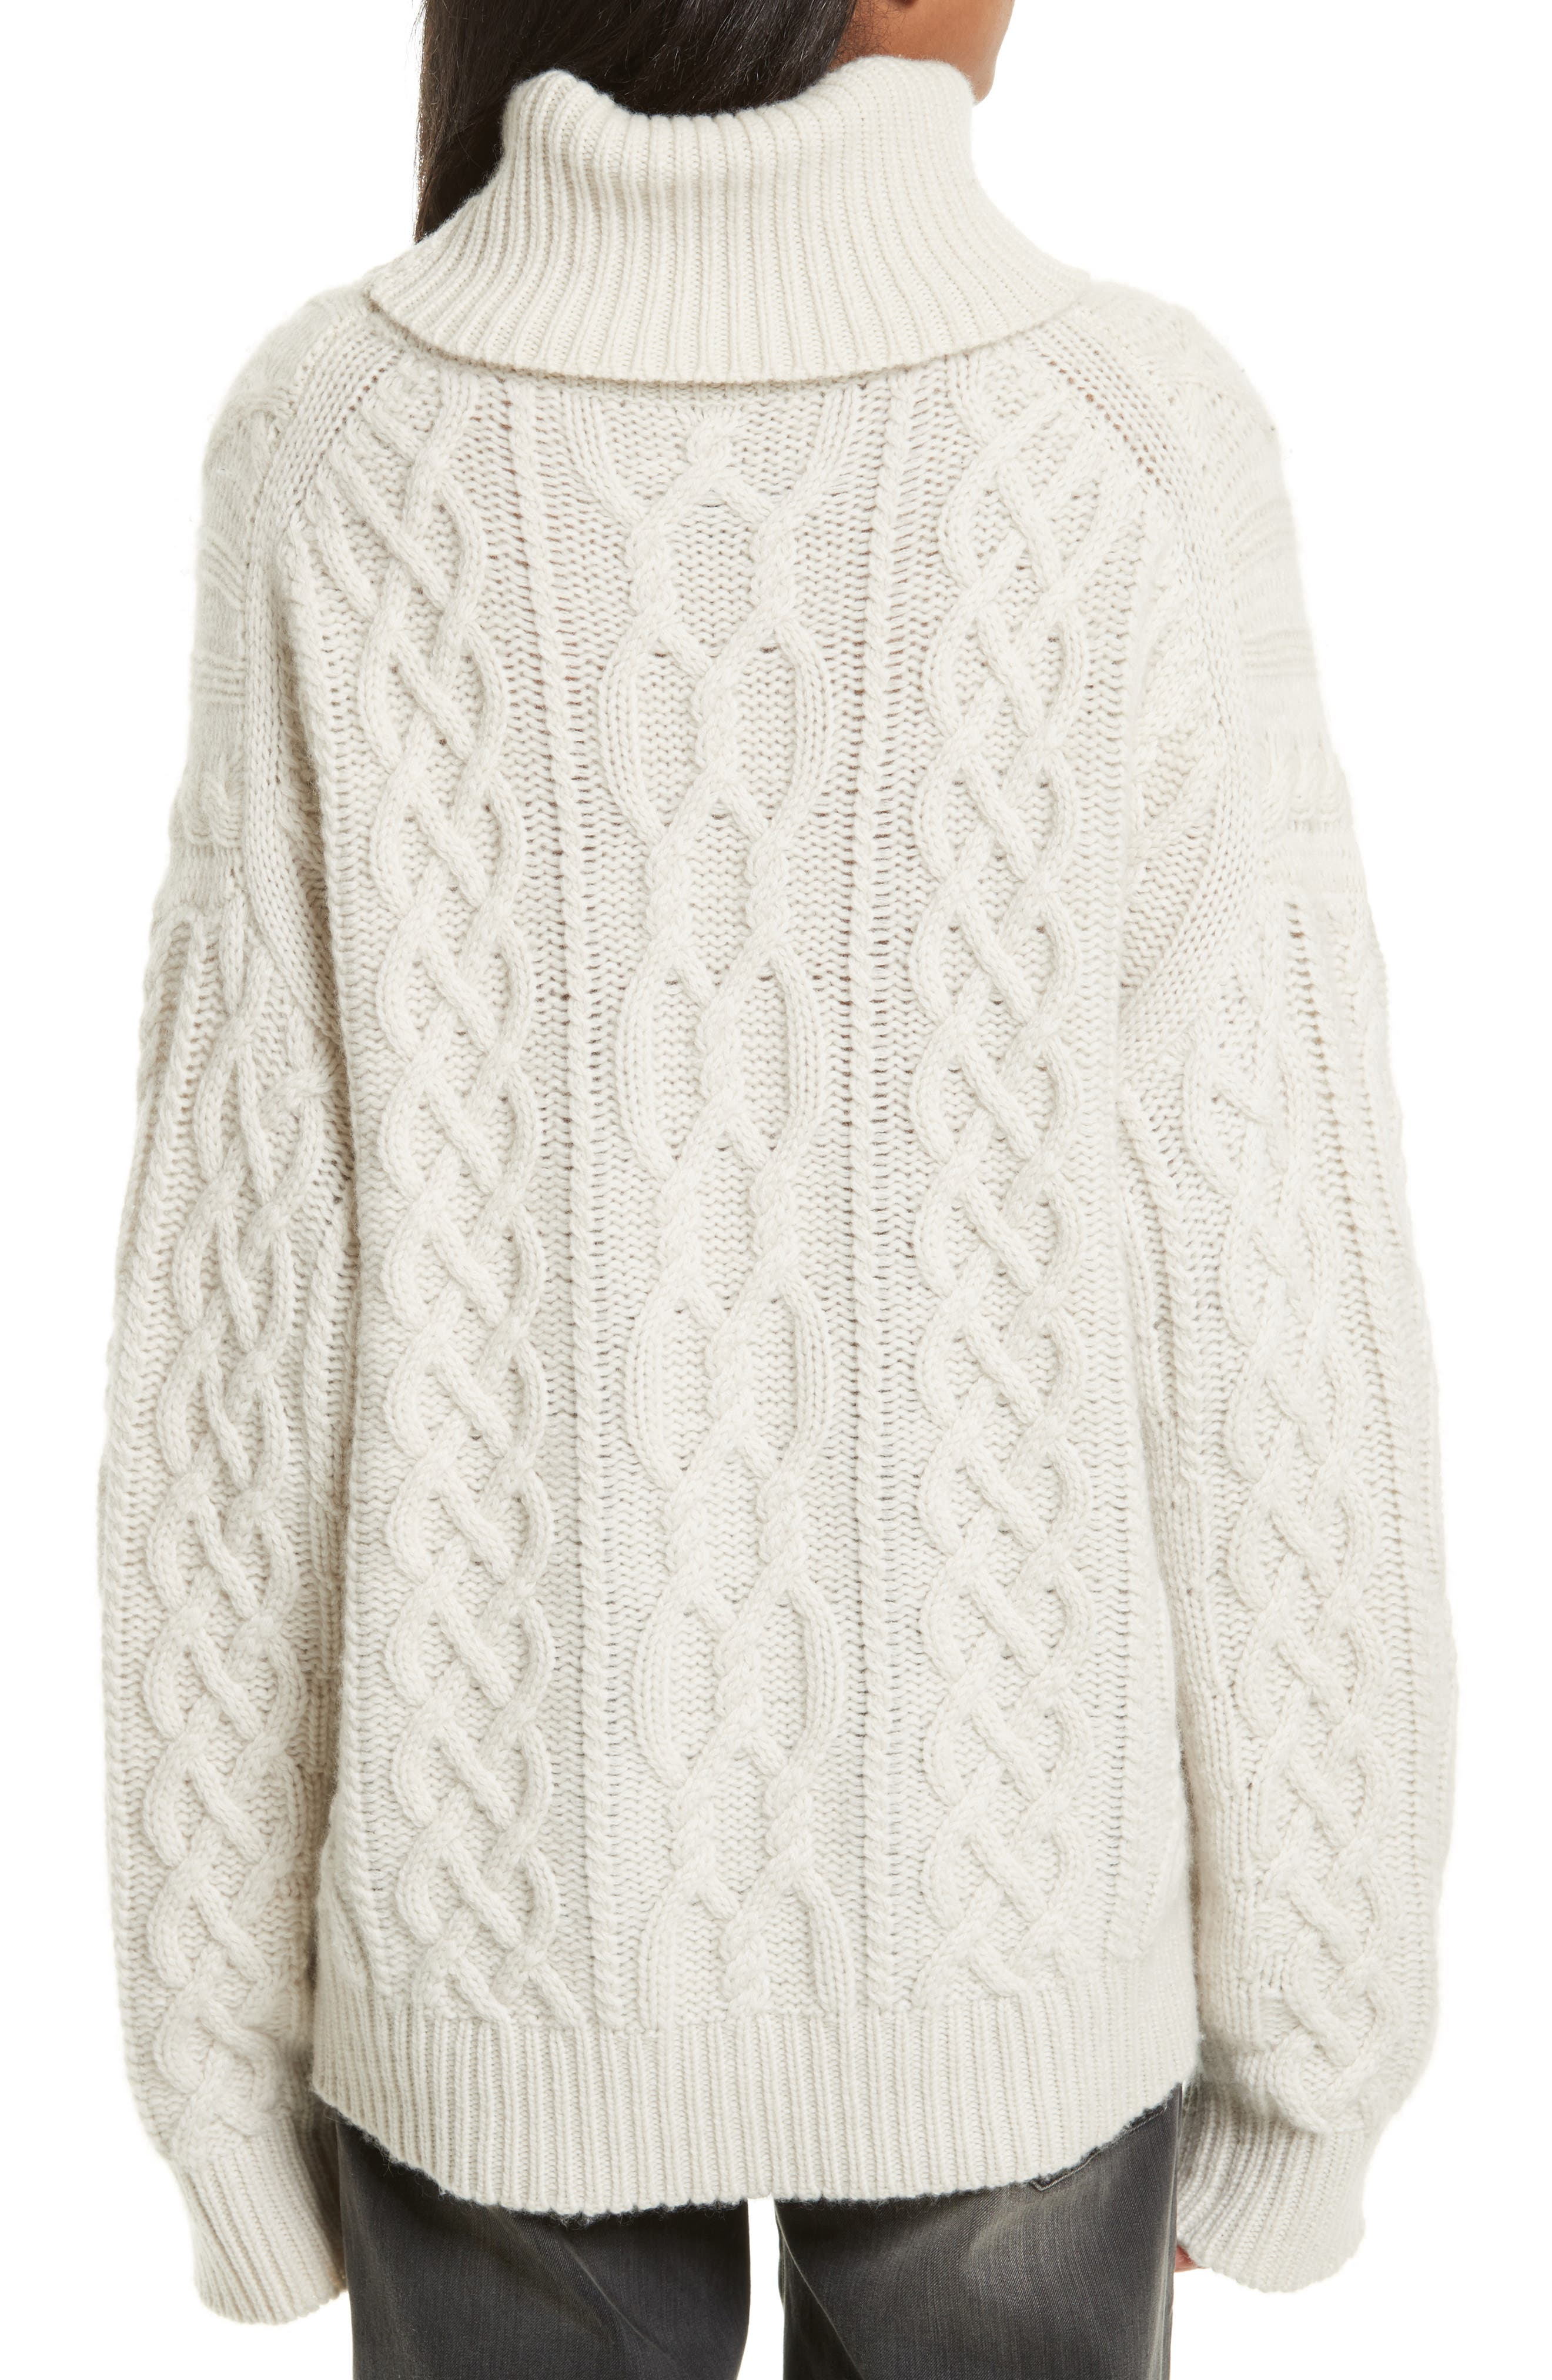 Cecil Cable Knit Cashmere Turtleneck Sweater,                             Alternate thumbnail 2, color,                             902